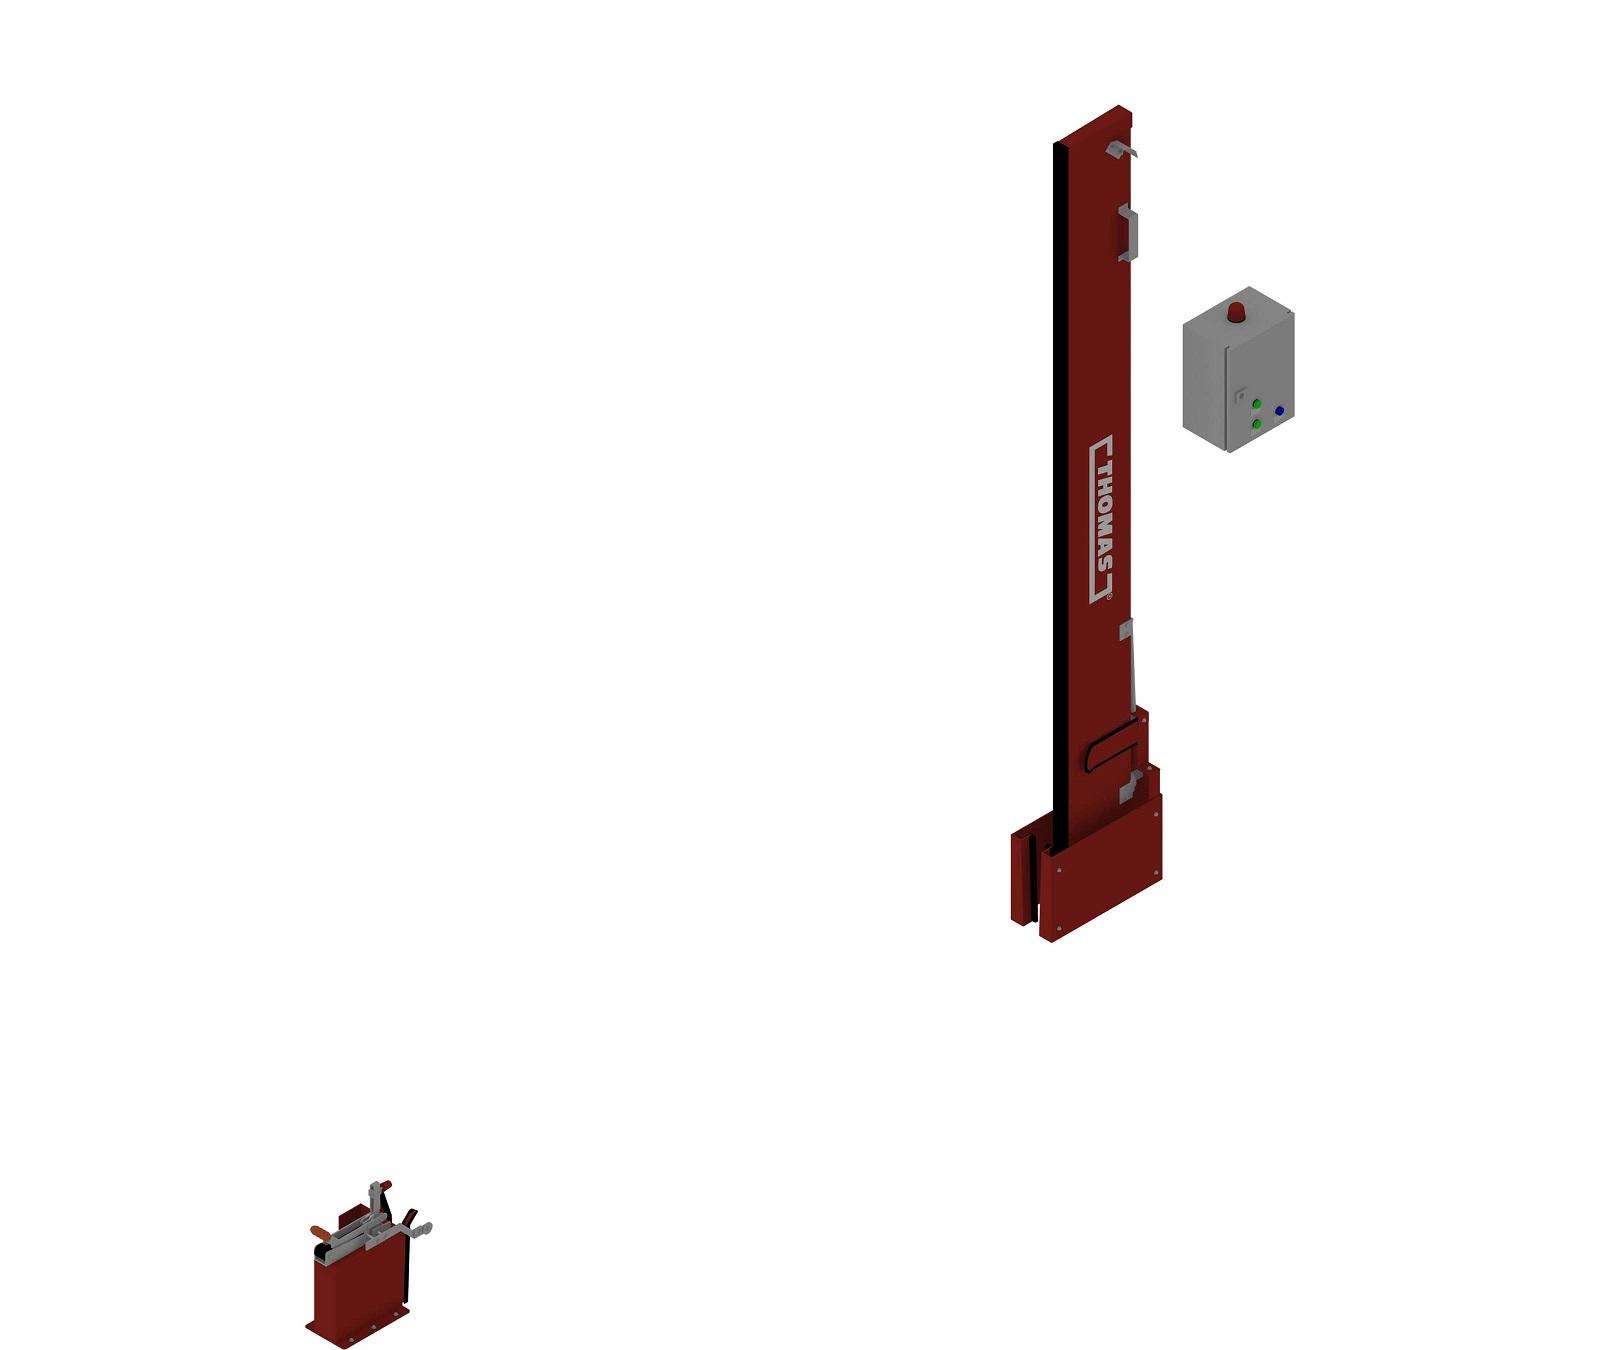 Automatische Löschwasserbarriere Vertikal Drehbar Manuelle Rückstellung offen